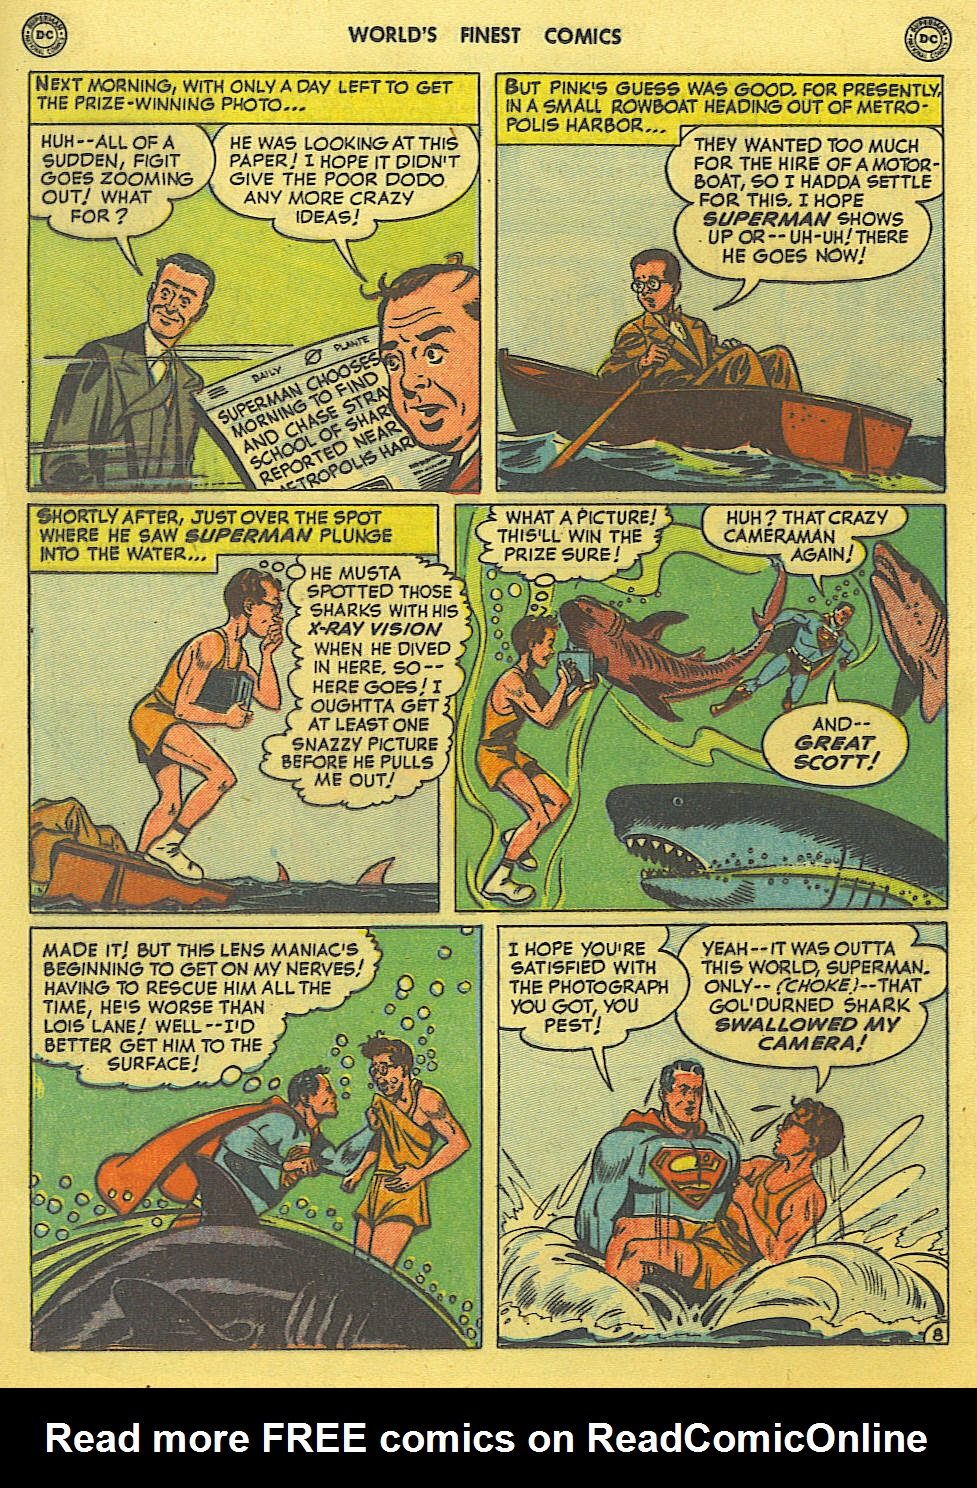 Read online World's Finest Comics comic -  Issue #49 - 11